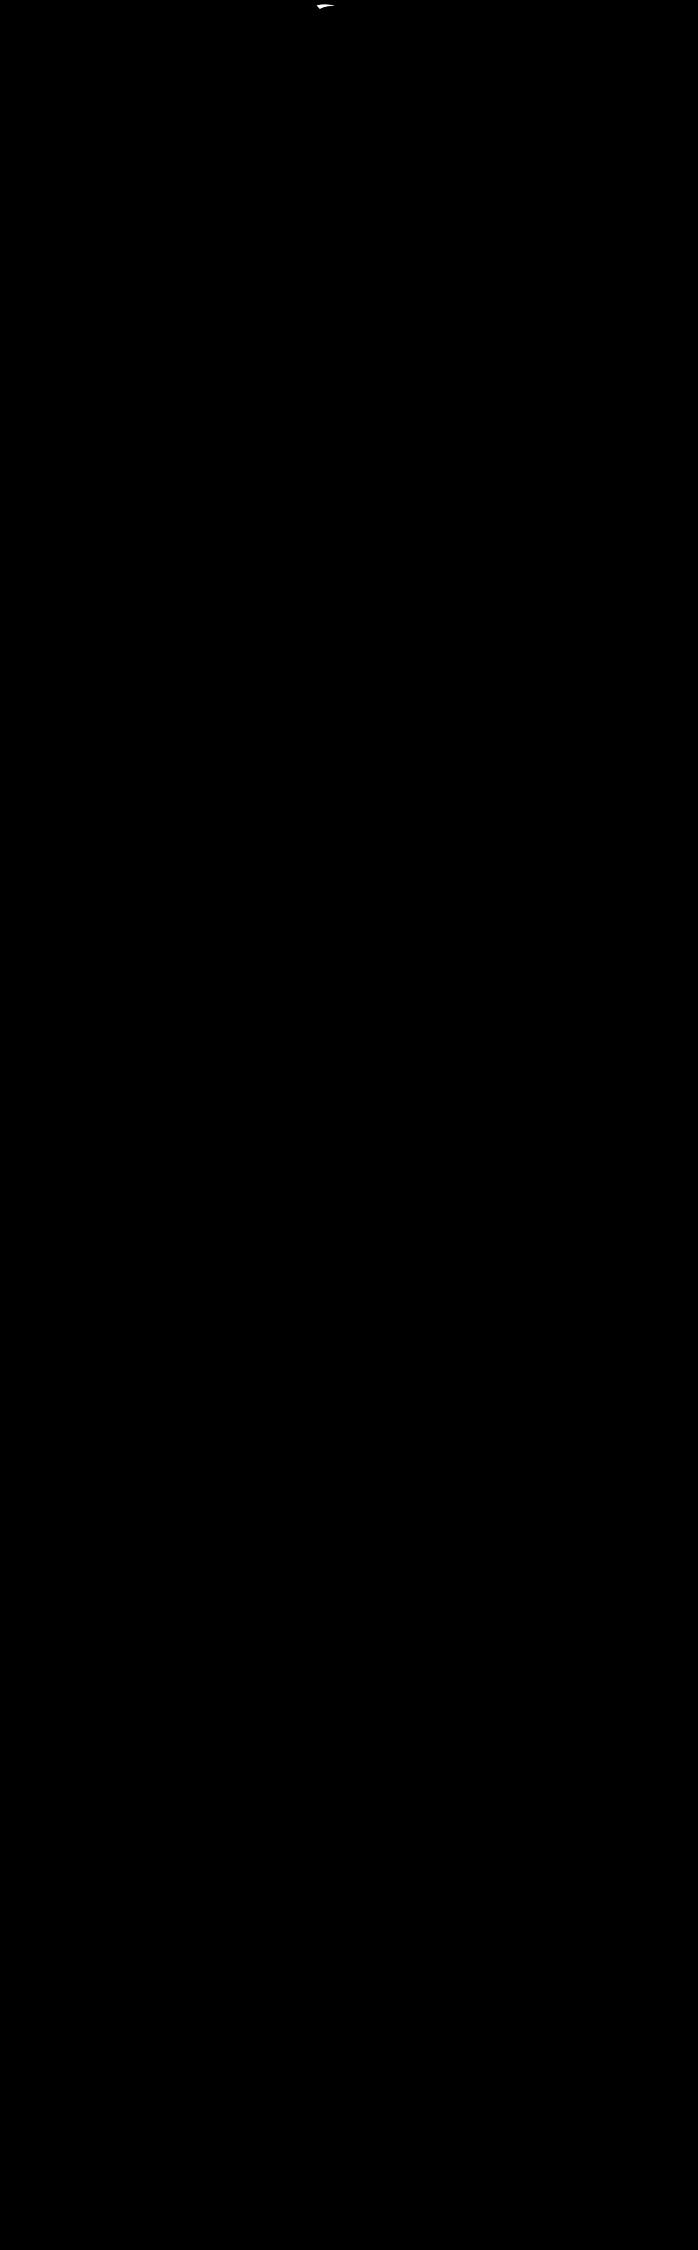 698x2250 Clipart